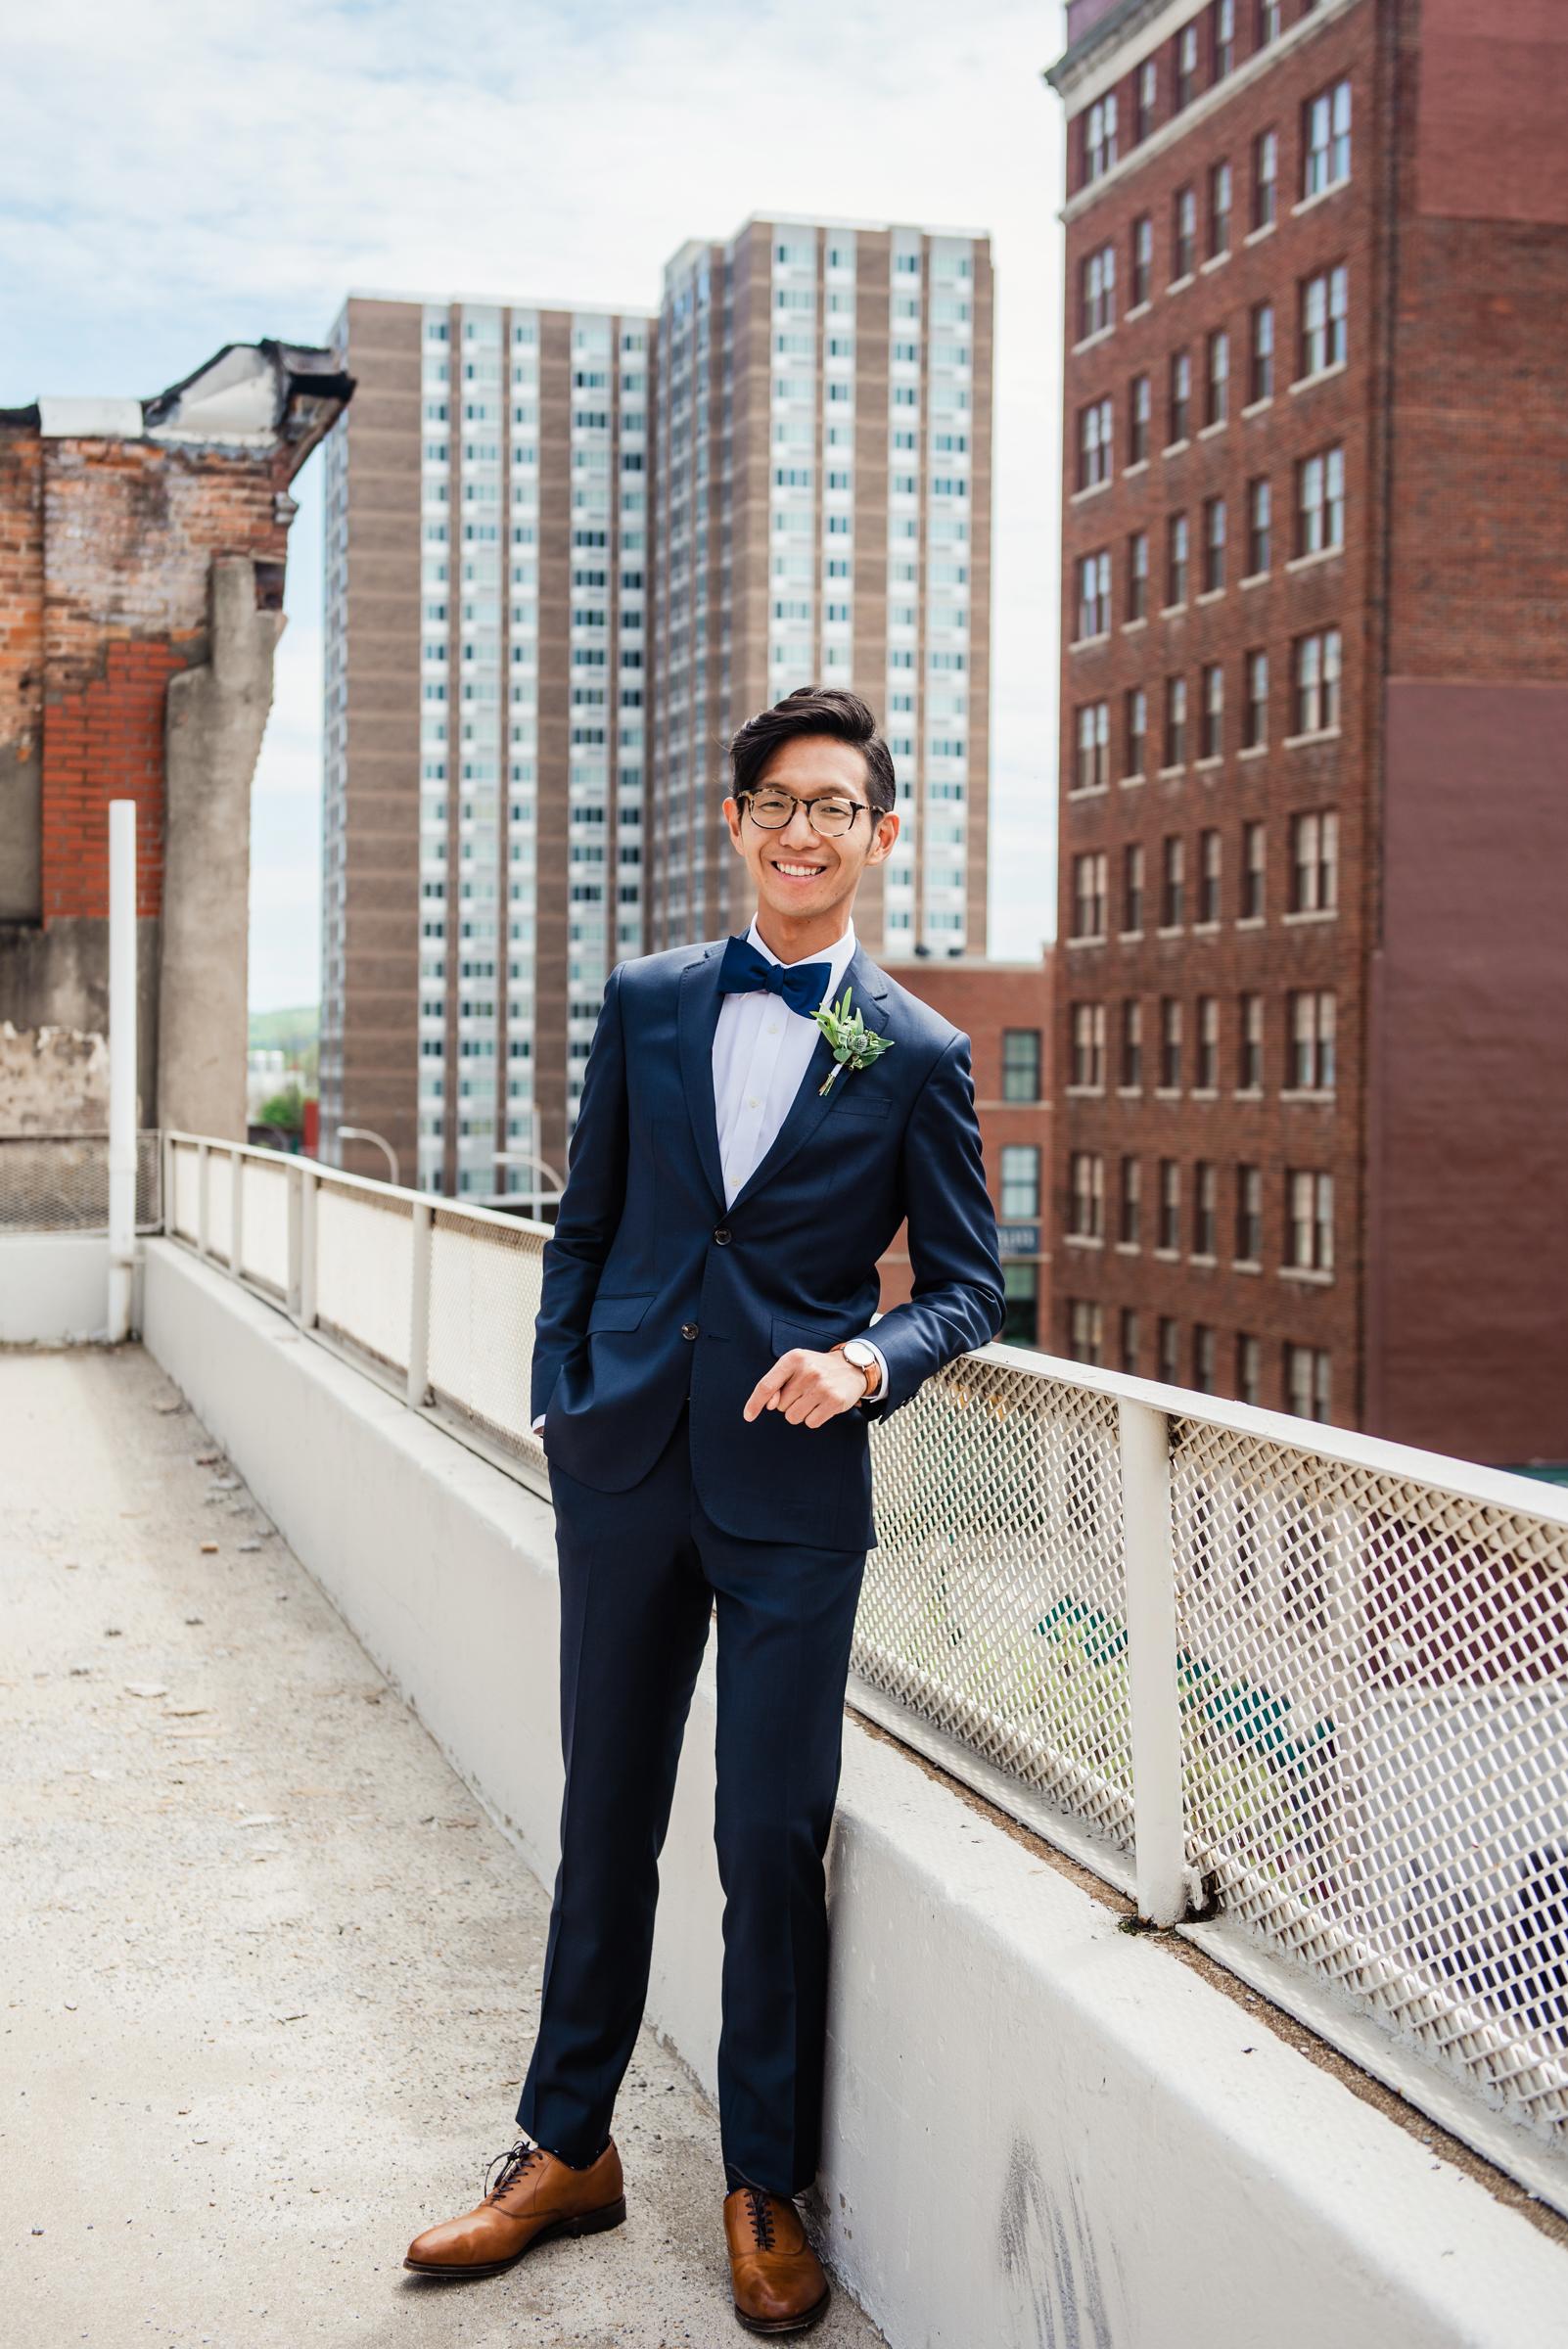 SKY_Armory_Syracuse_Wedding_JILL_STUDIO_Rochester_NY_Photographer_DSC_5305.jpg